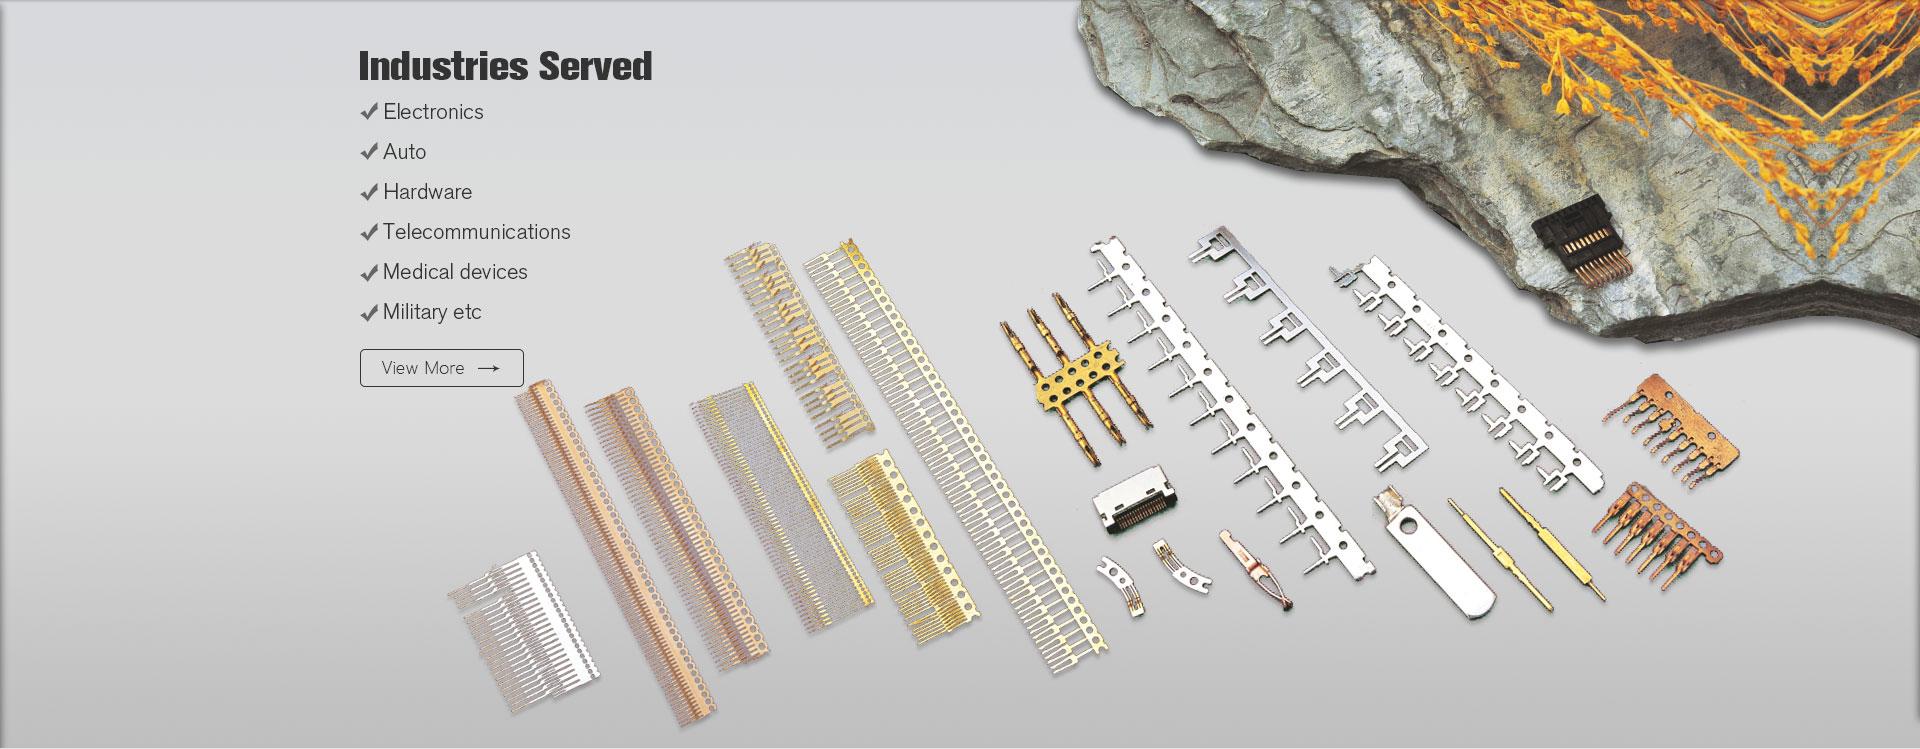 Stamping Die, Tooling Spare Parts, Metal Stamping